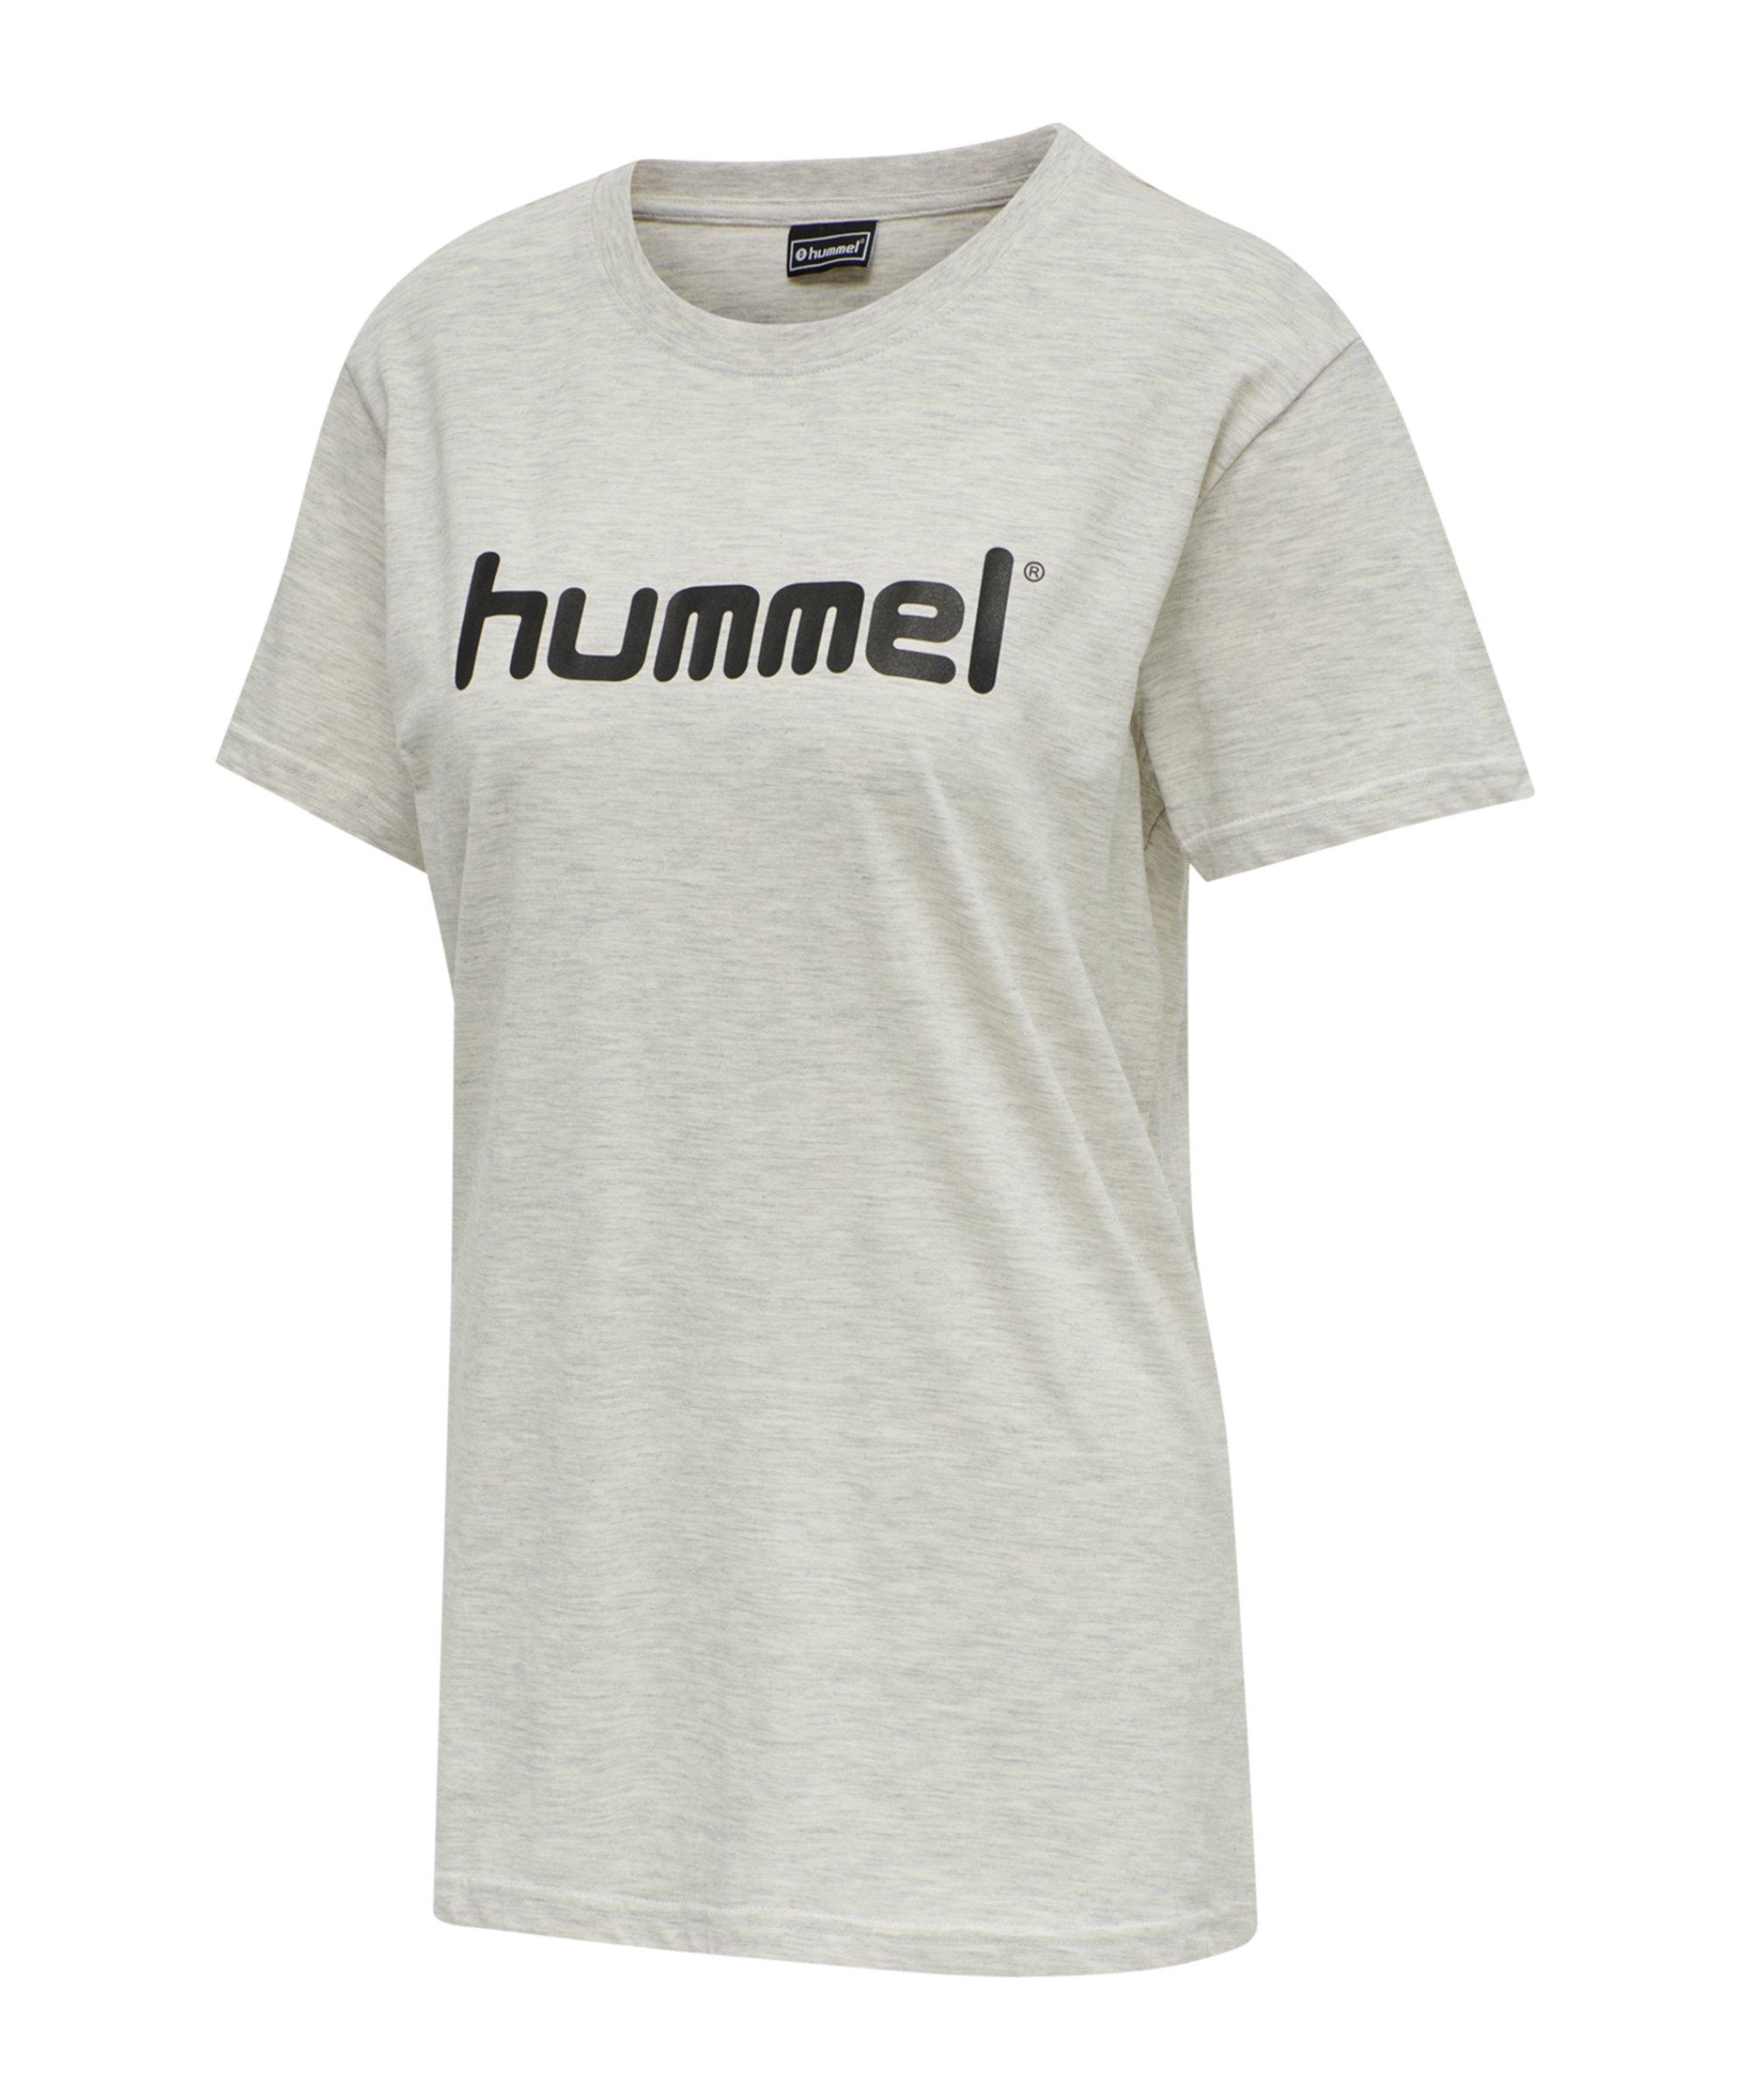 Hummel Cotton T-Shirt Logo Damen Beige F9158 - beige